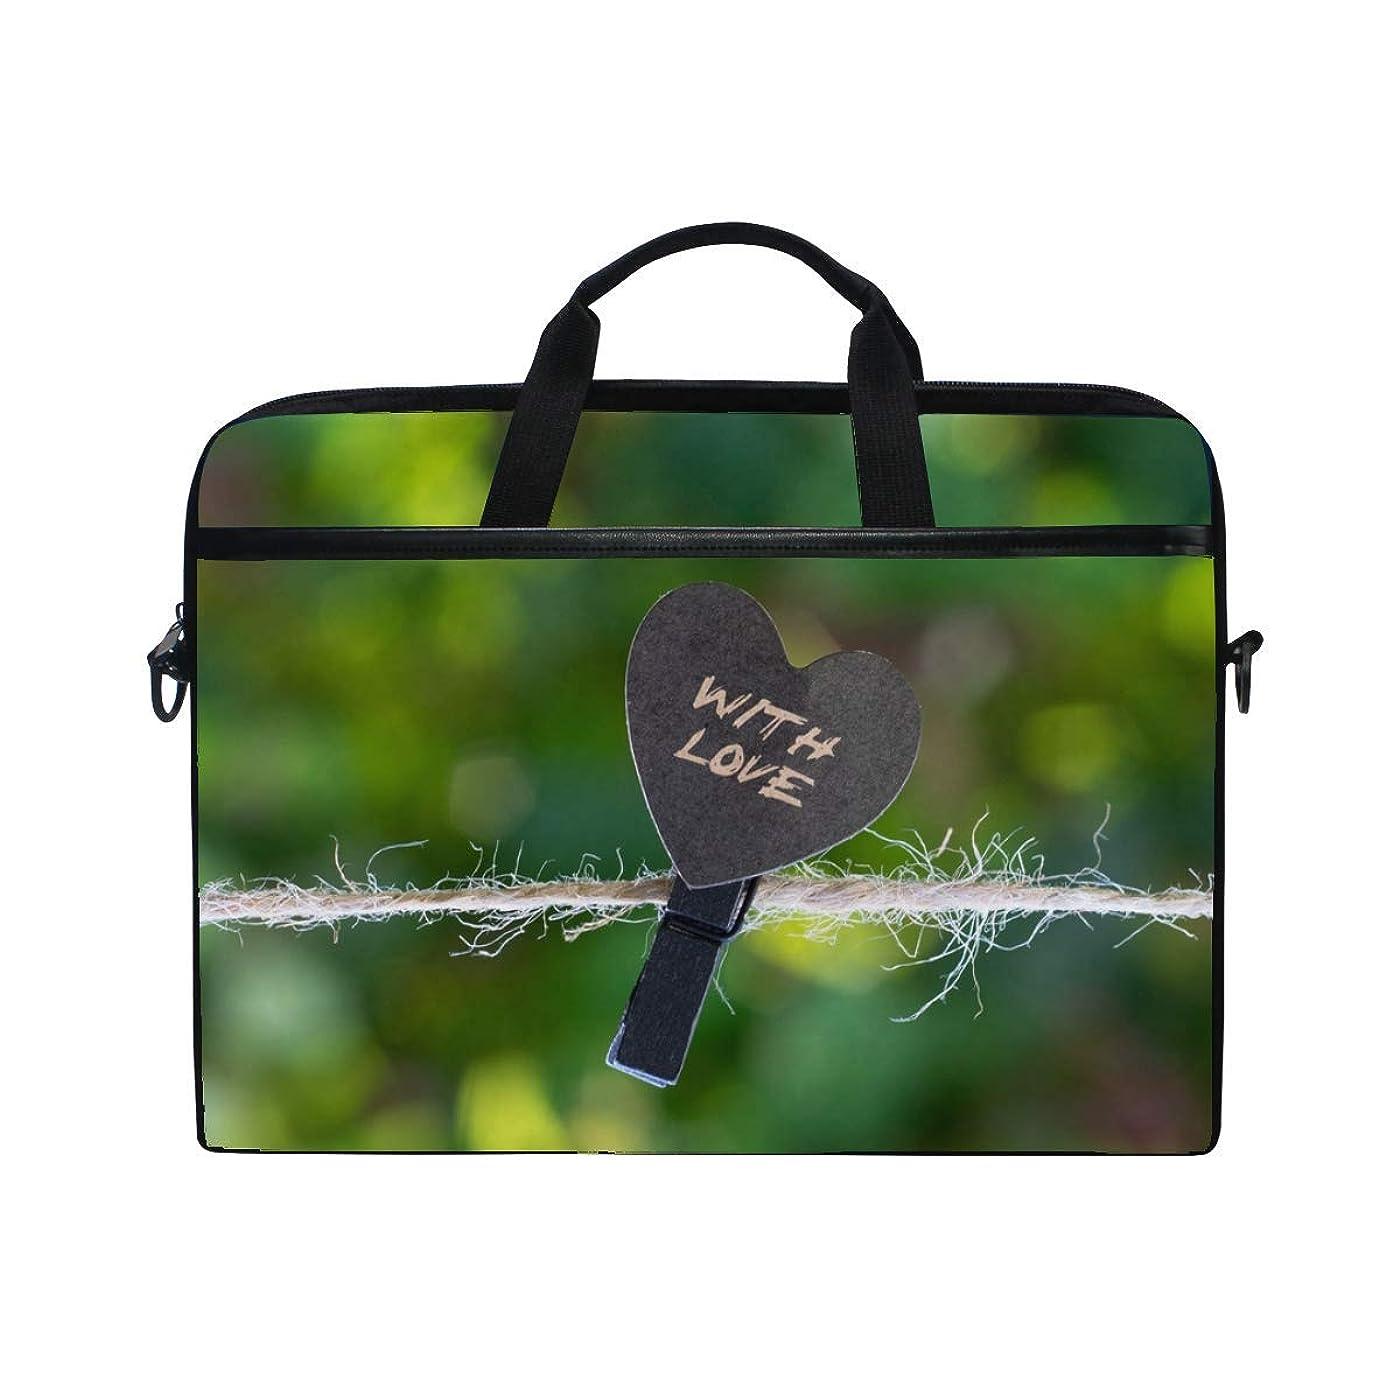 963e6660d948 clothespin bag - kosodate-kitchen.com